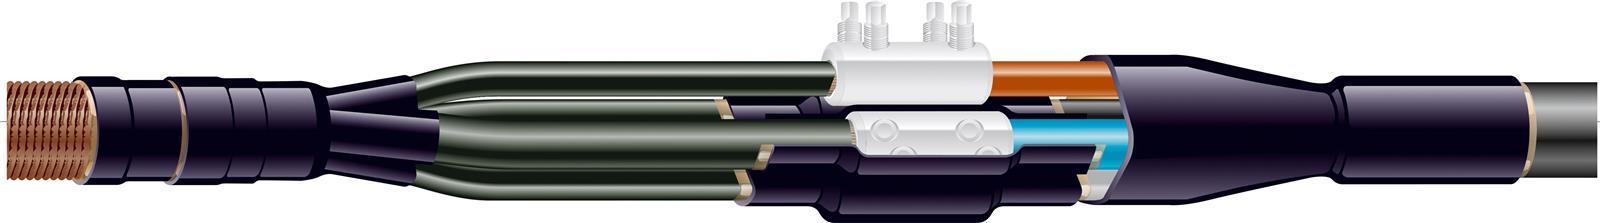 KABELSKARV LJTM-W-4X095-240